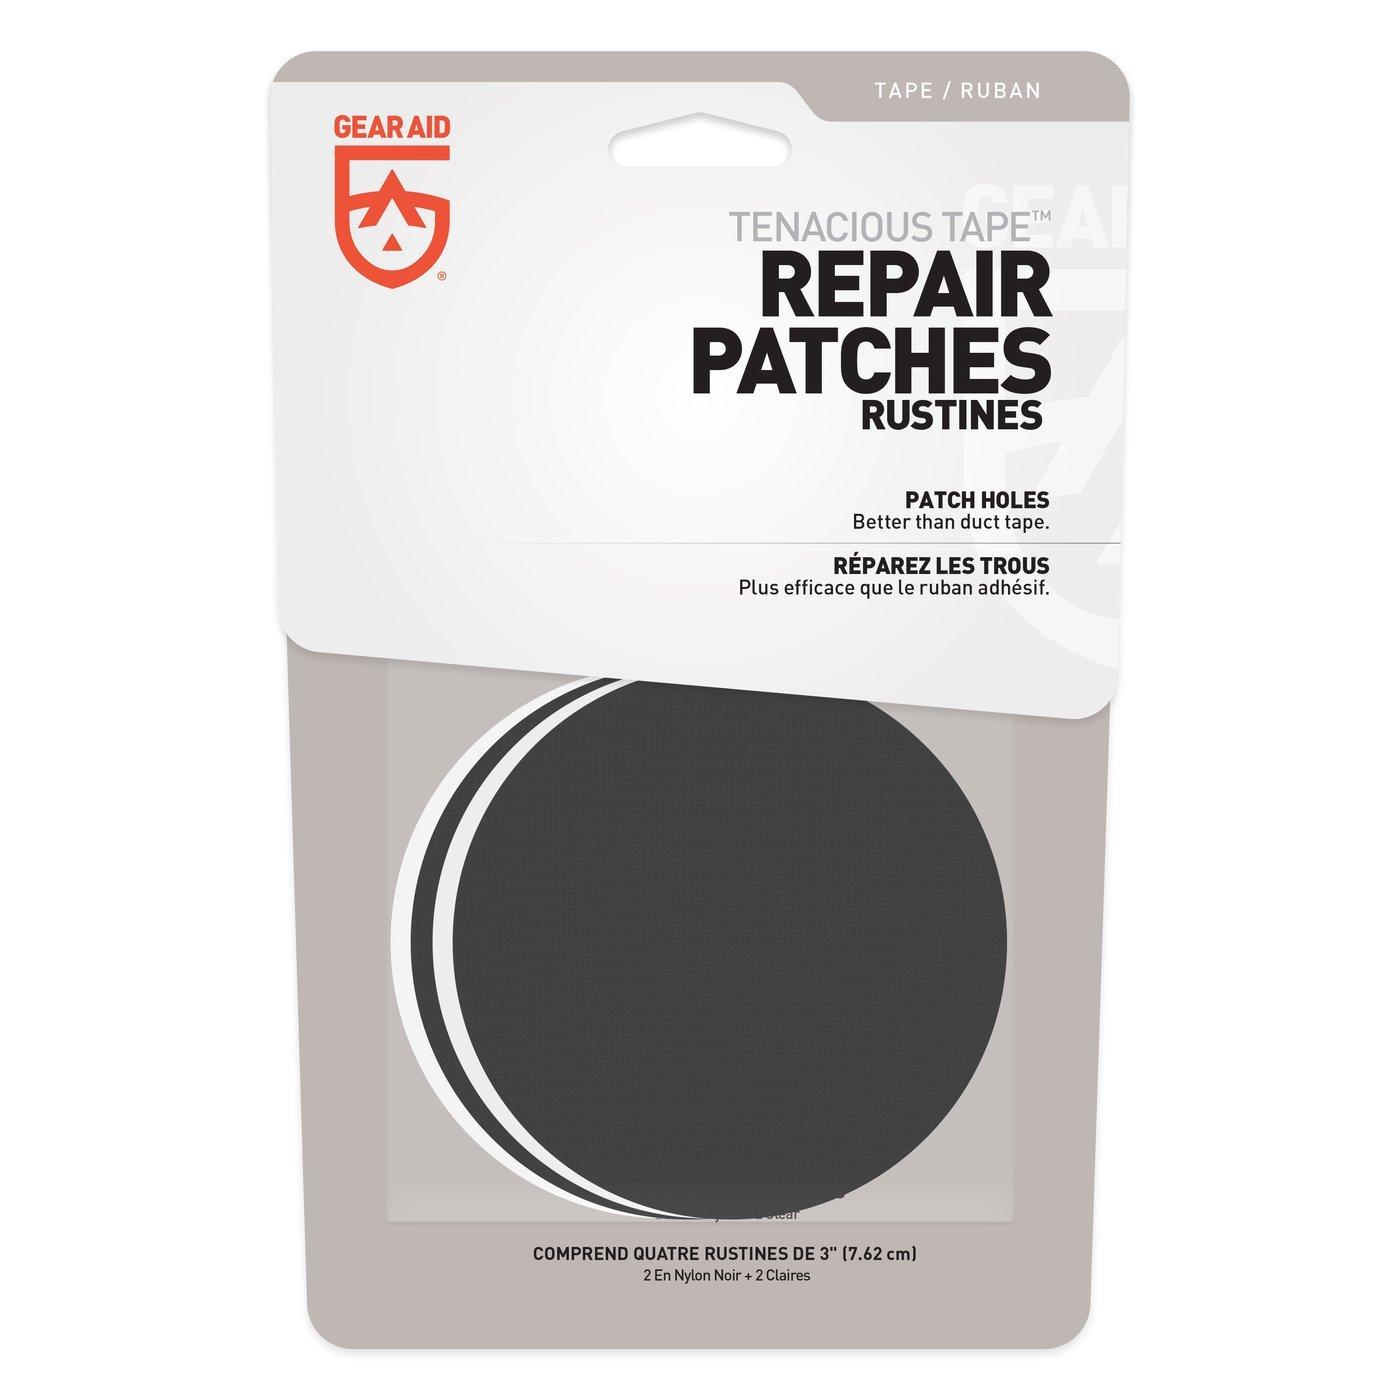 Tenacious Tape 4pc Repair Patches